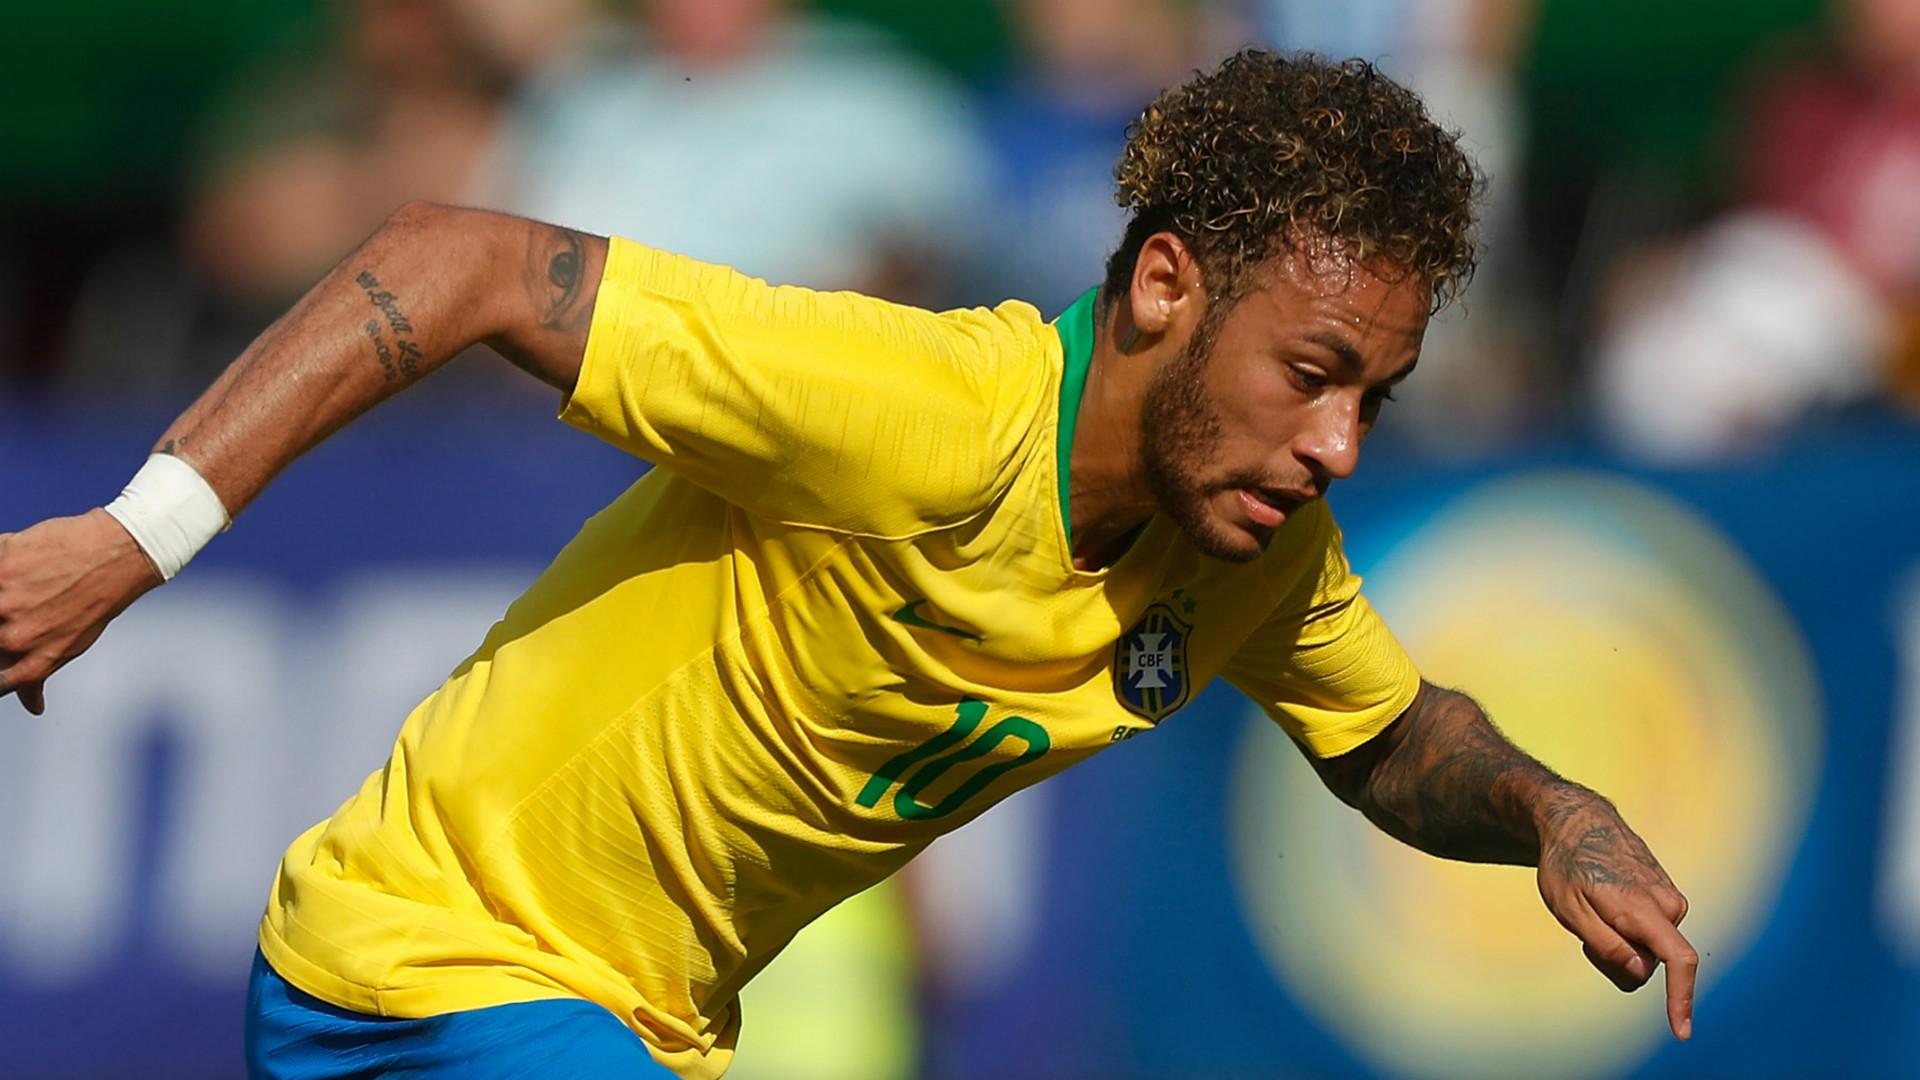 Video: Brazil v Switzerland - Head-to-Head Preview